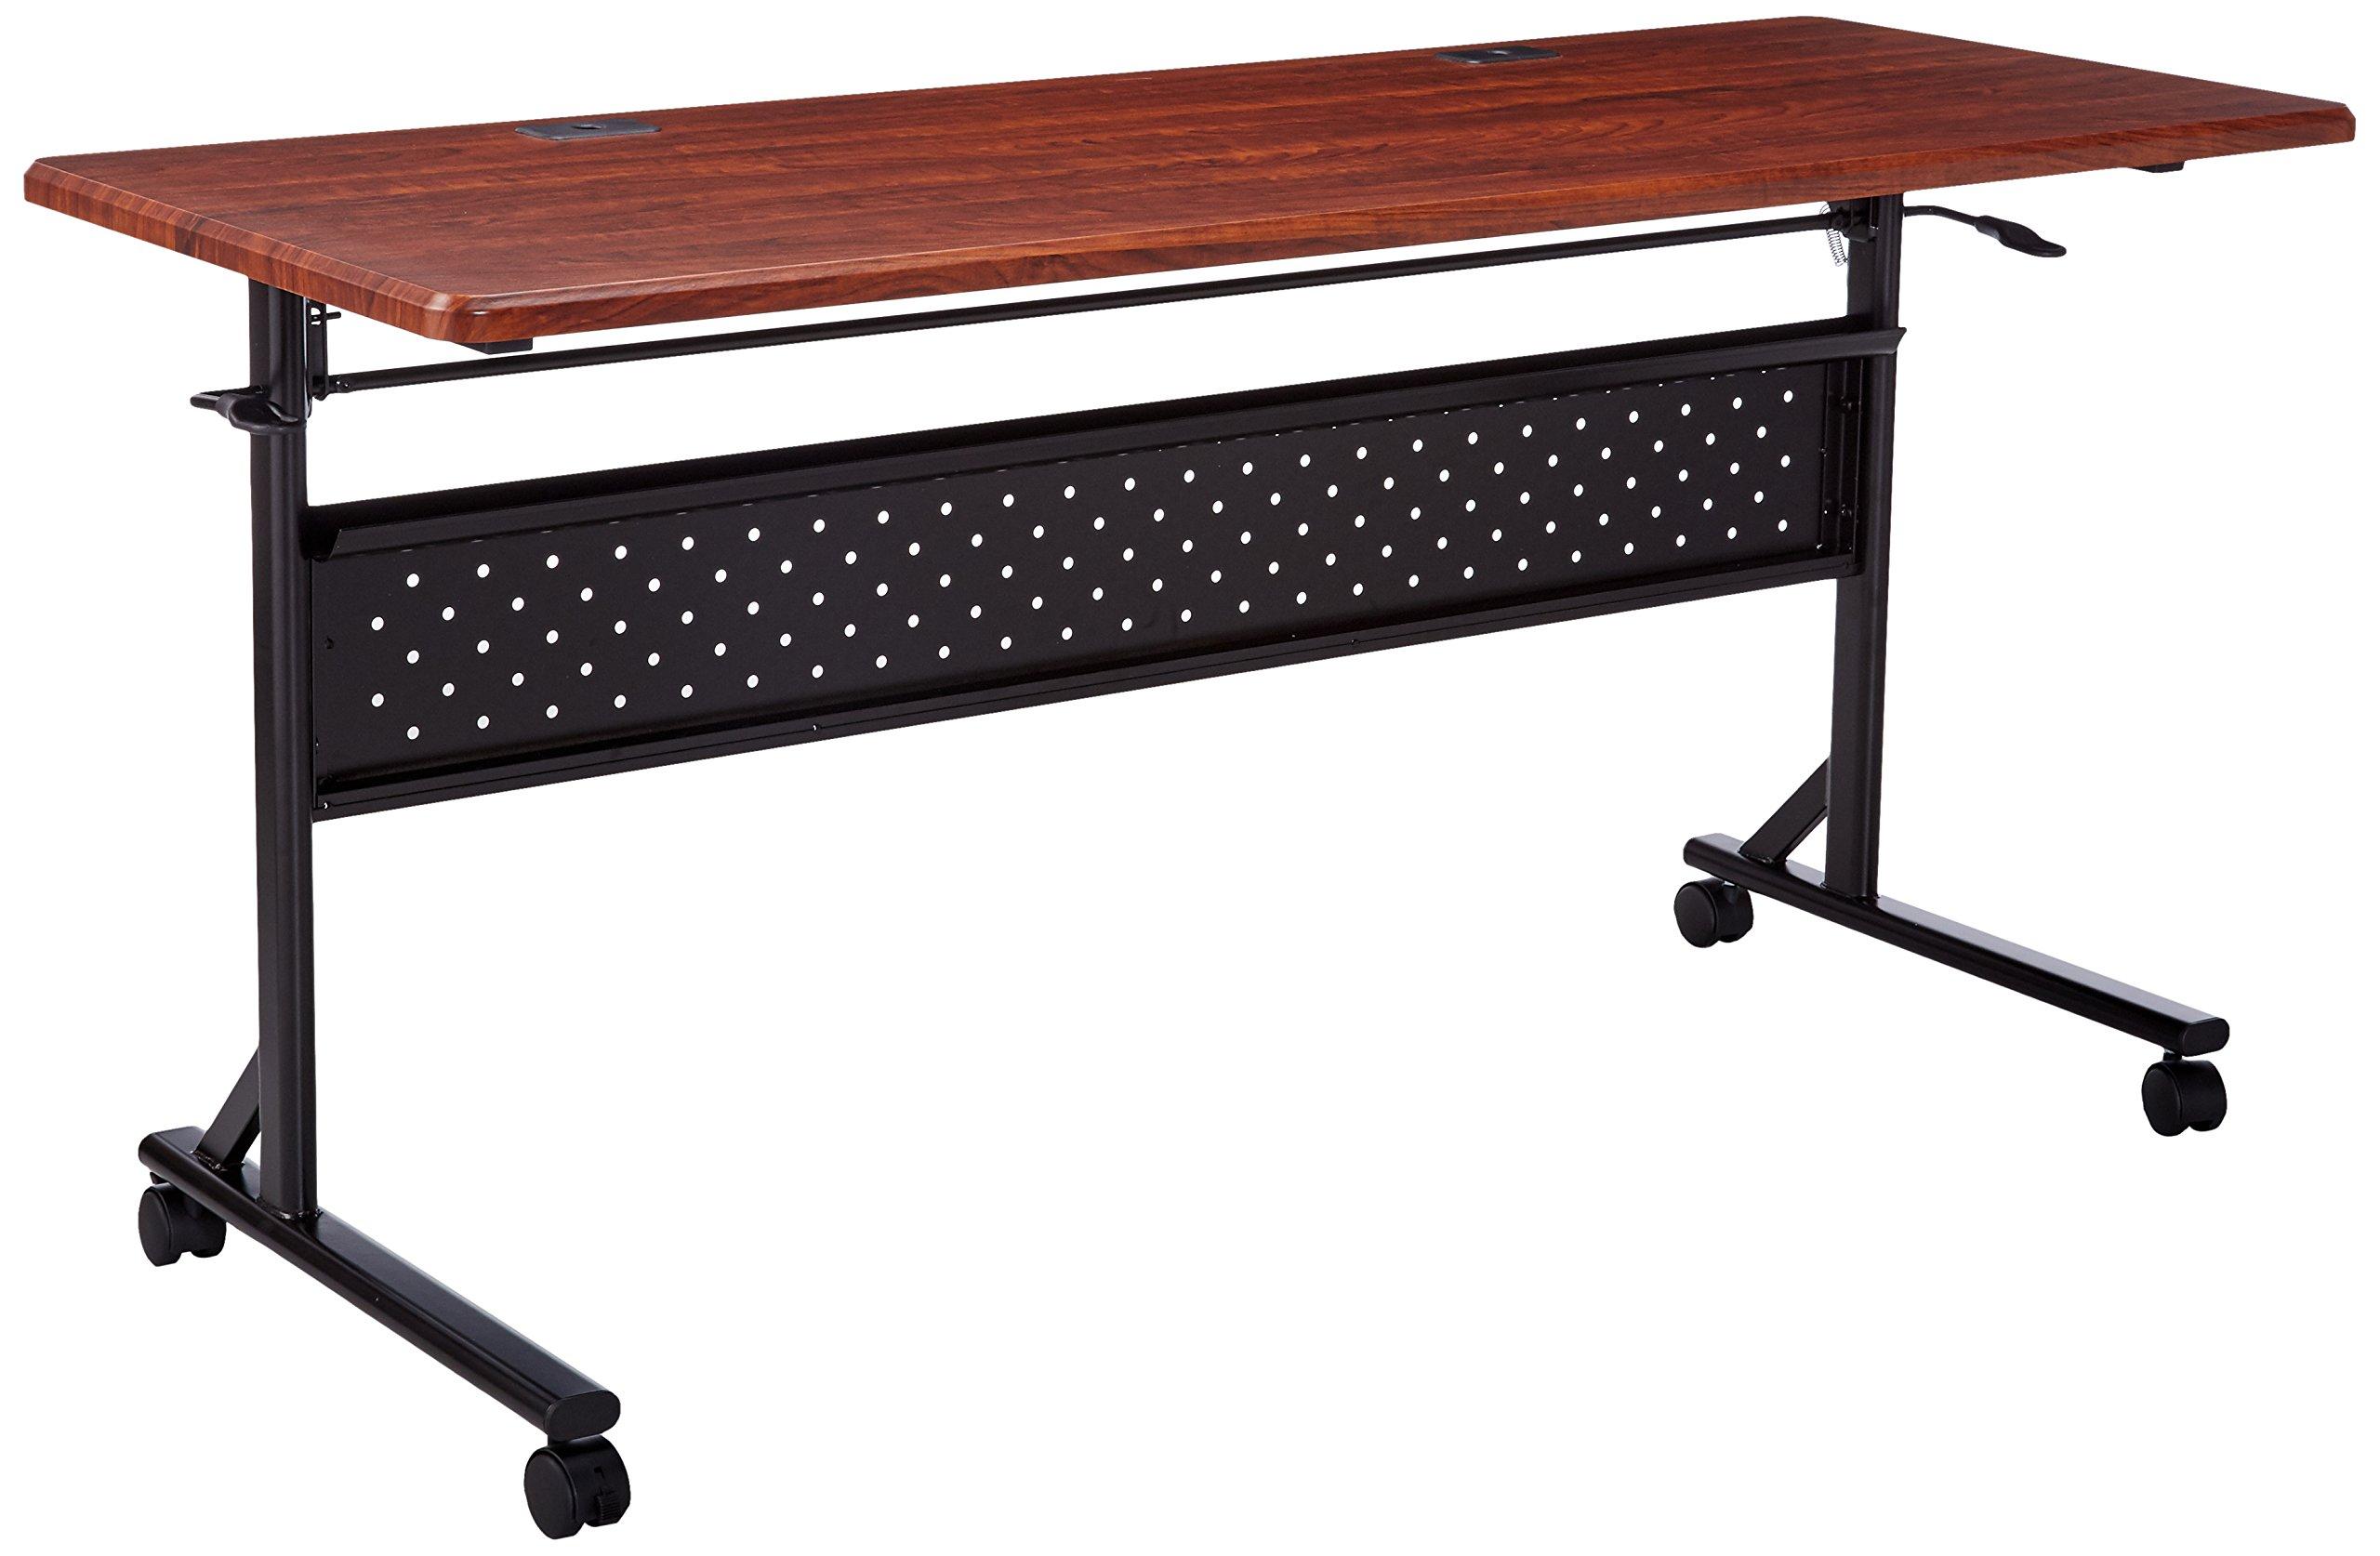 Lorell  Flipper Training Tables, 2.95'' Height X 26.77'' Width X 61.81'' Length, Cherry